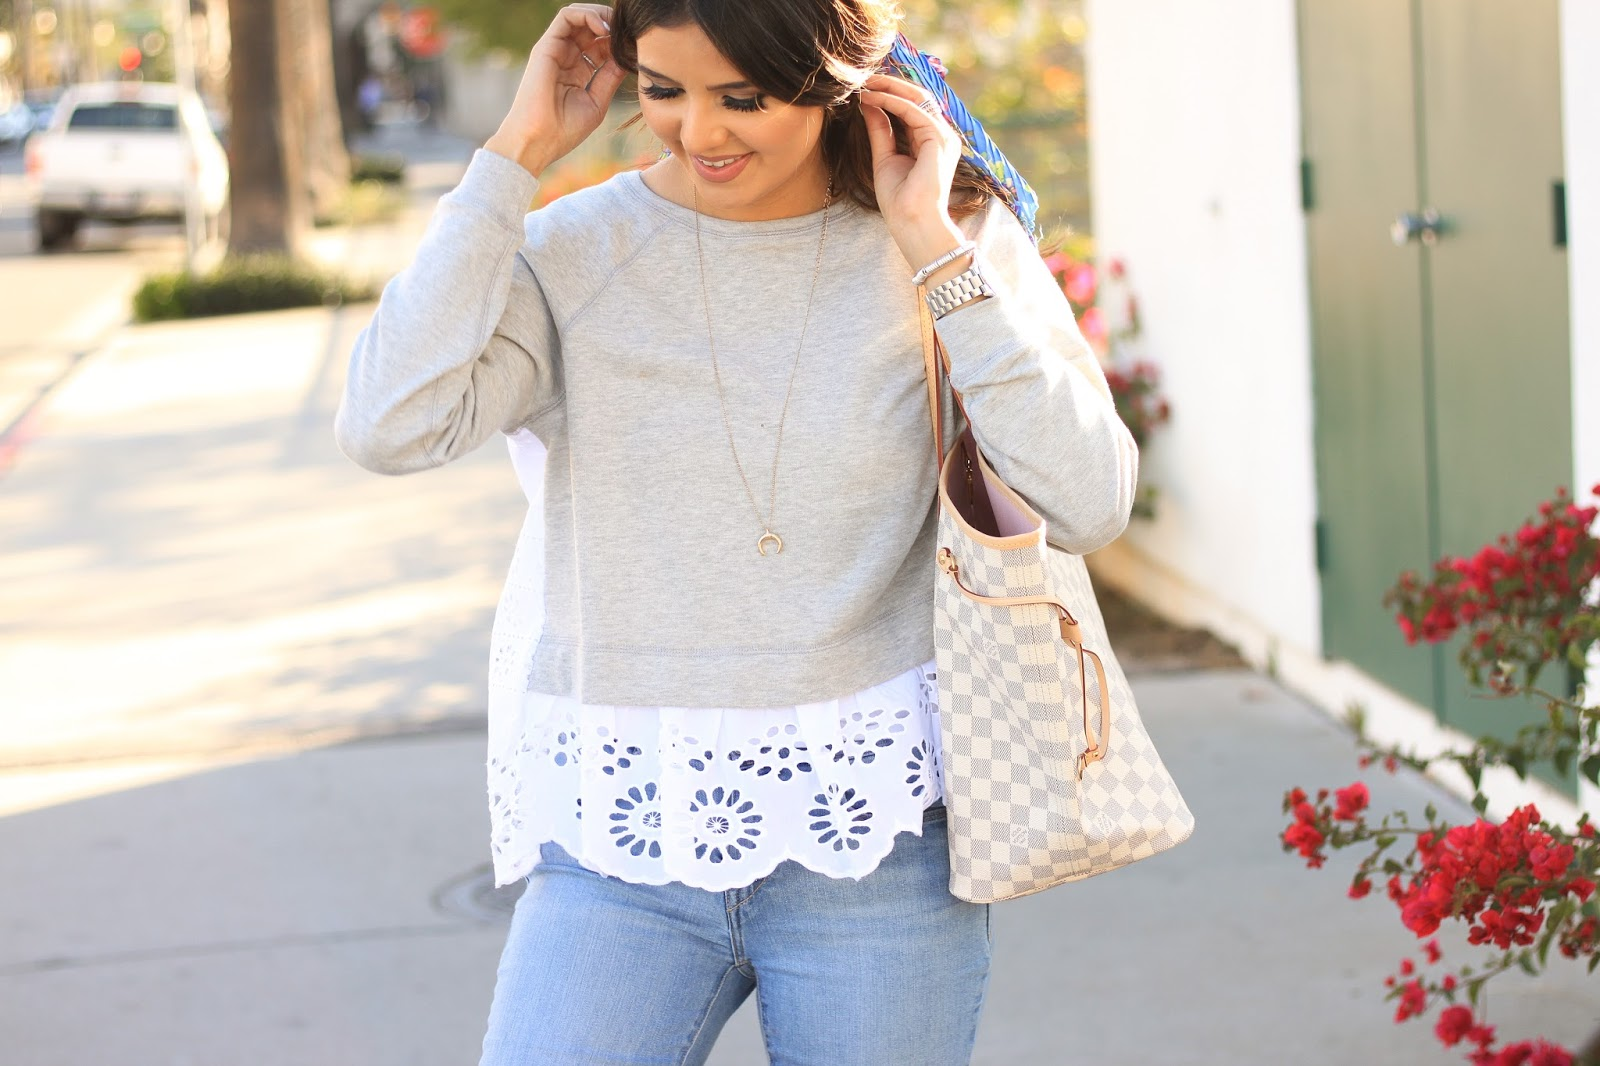 Eyeylet Sweatshirt with Louis Vuitton Neverfull GM